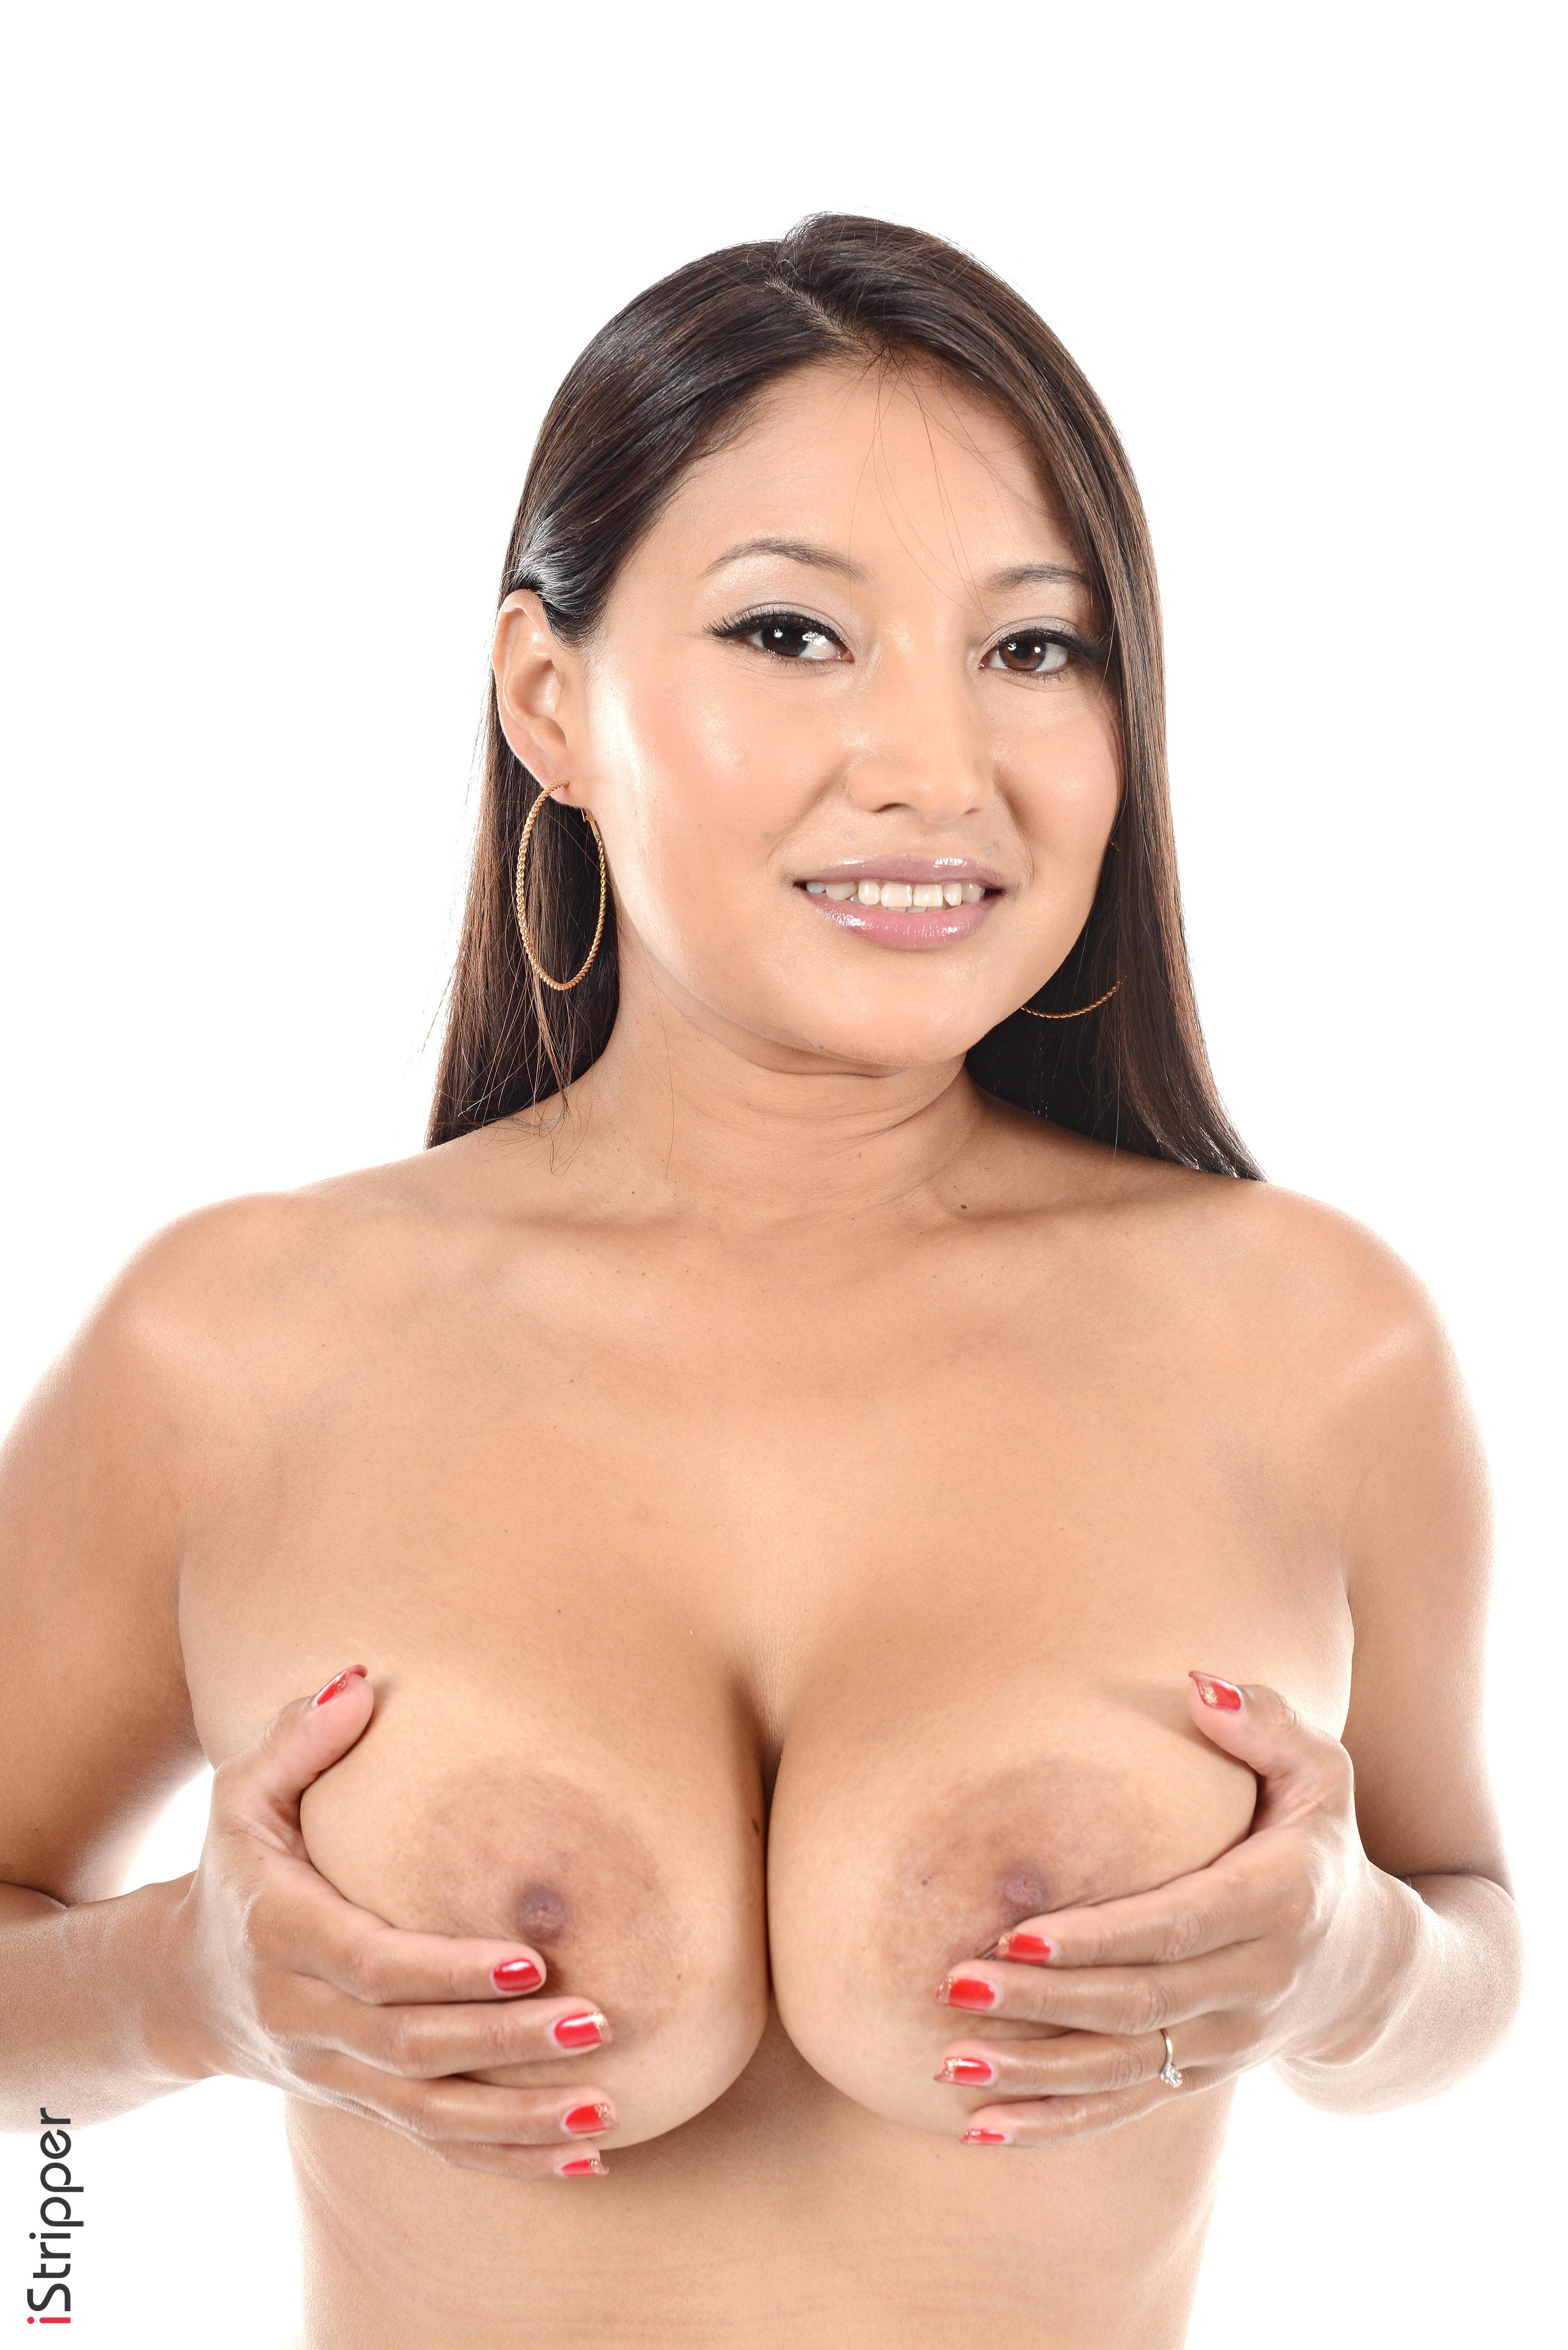 erotic nude desktop wallpaper hd